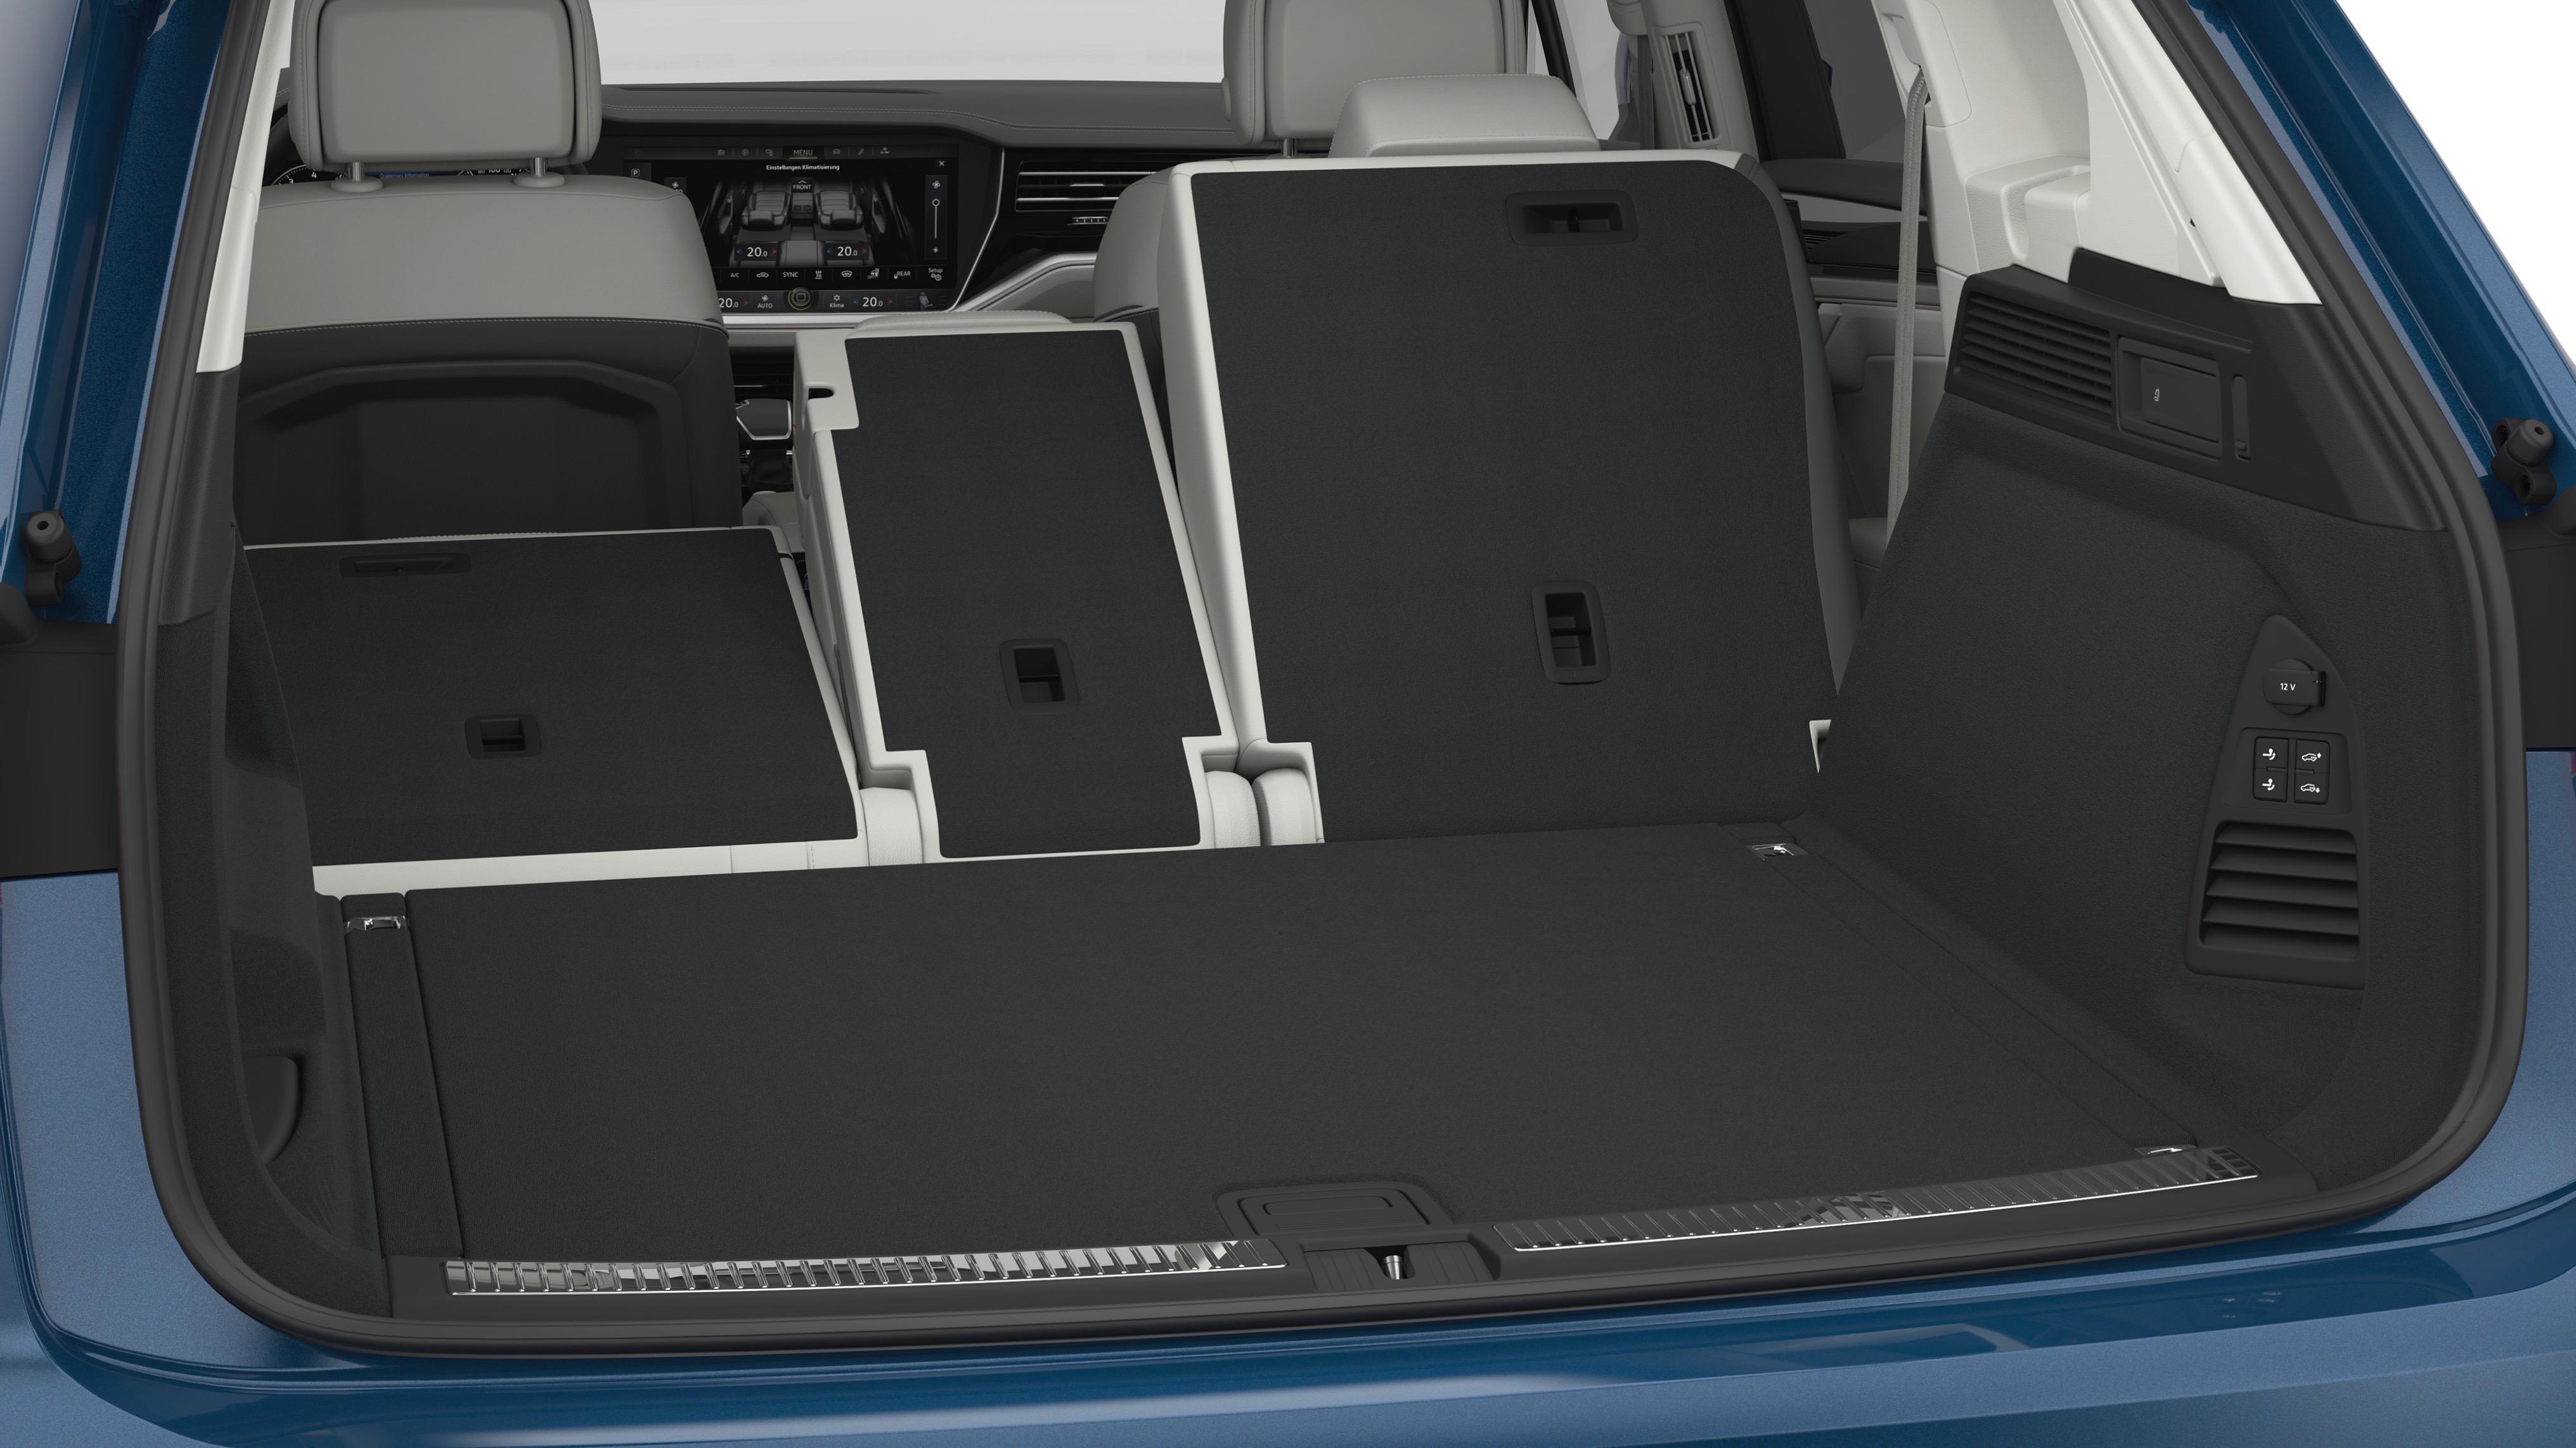 Volkswagen Touareg boot